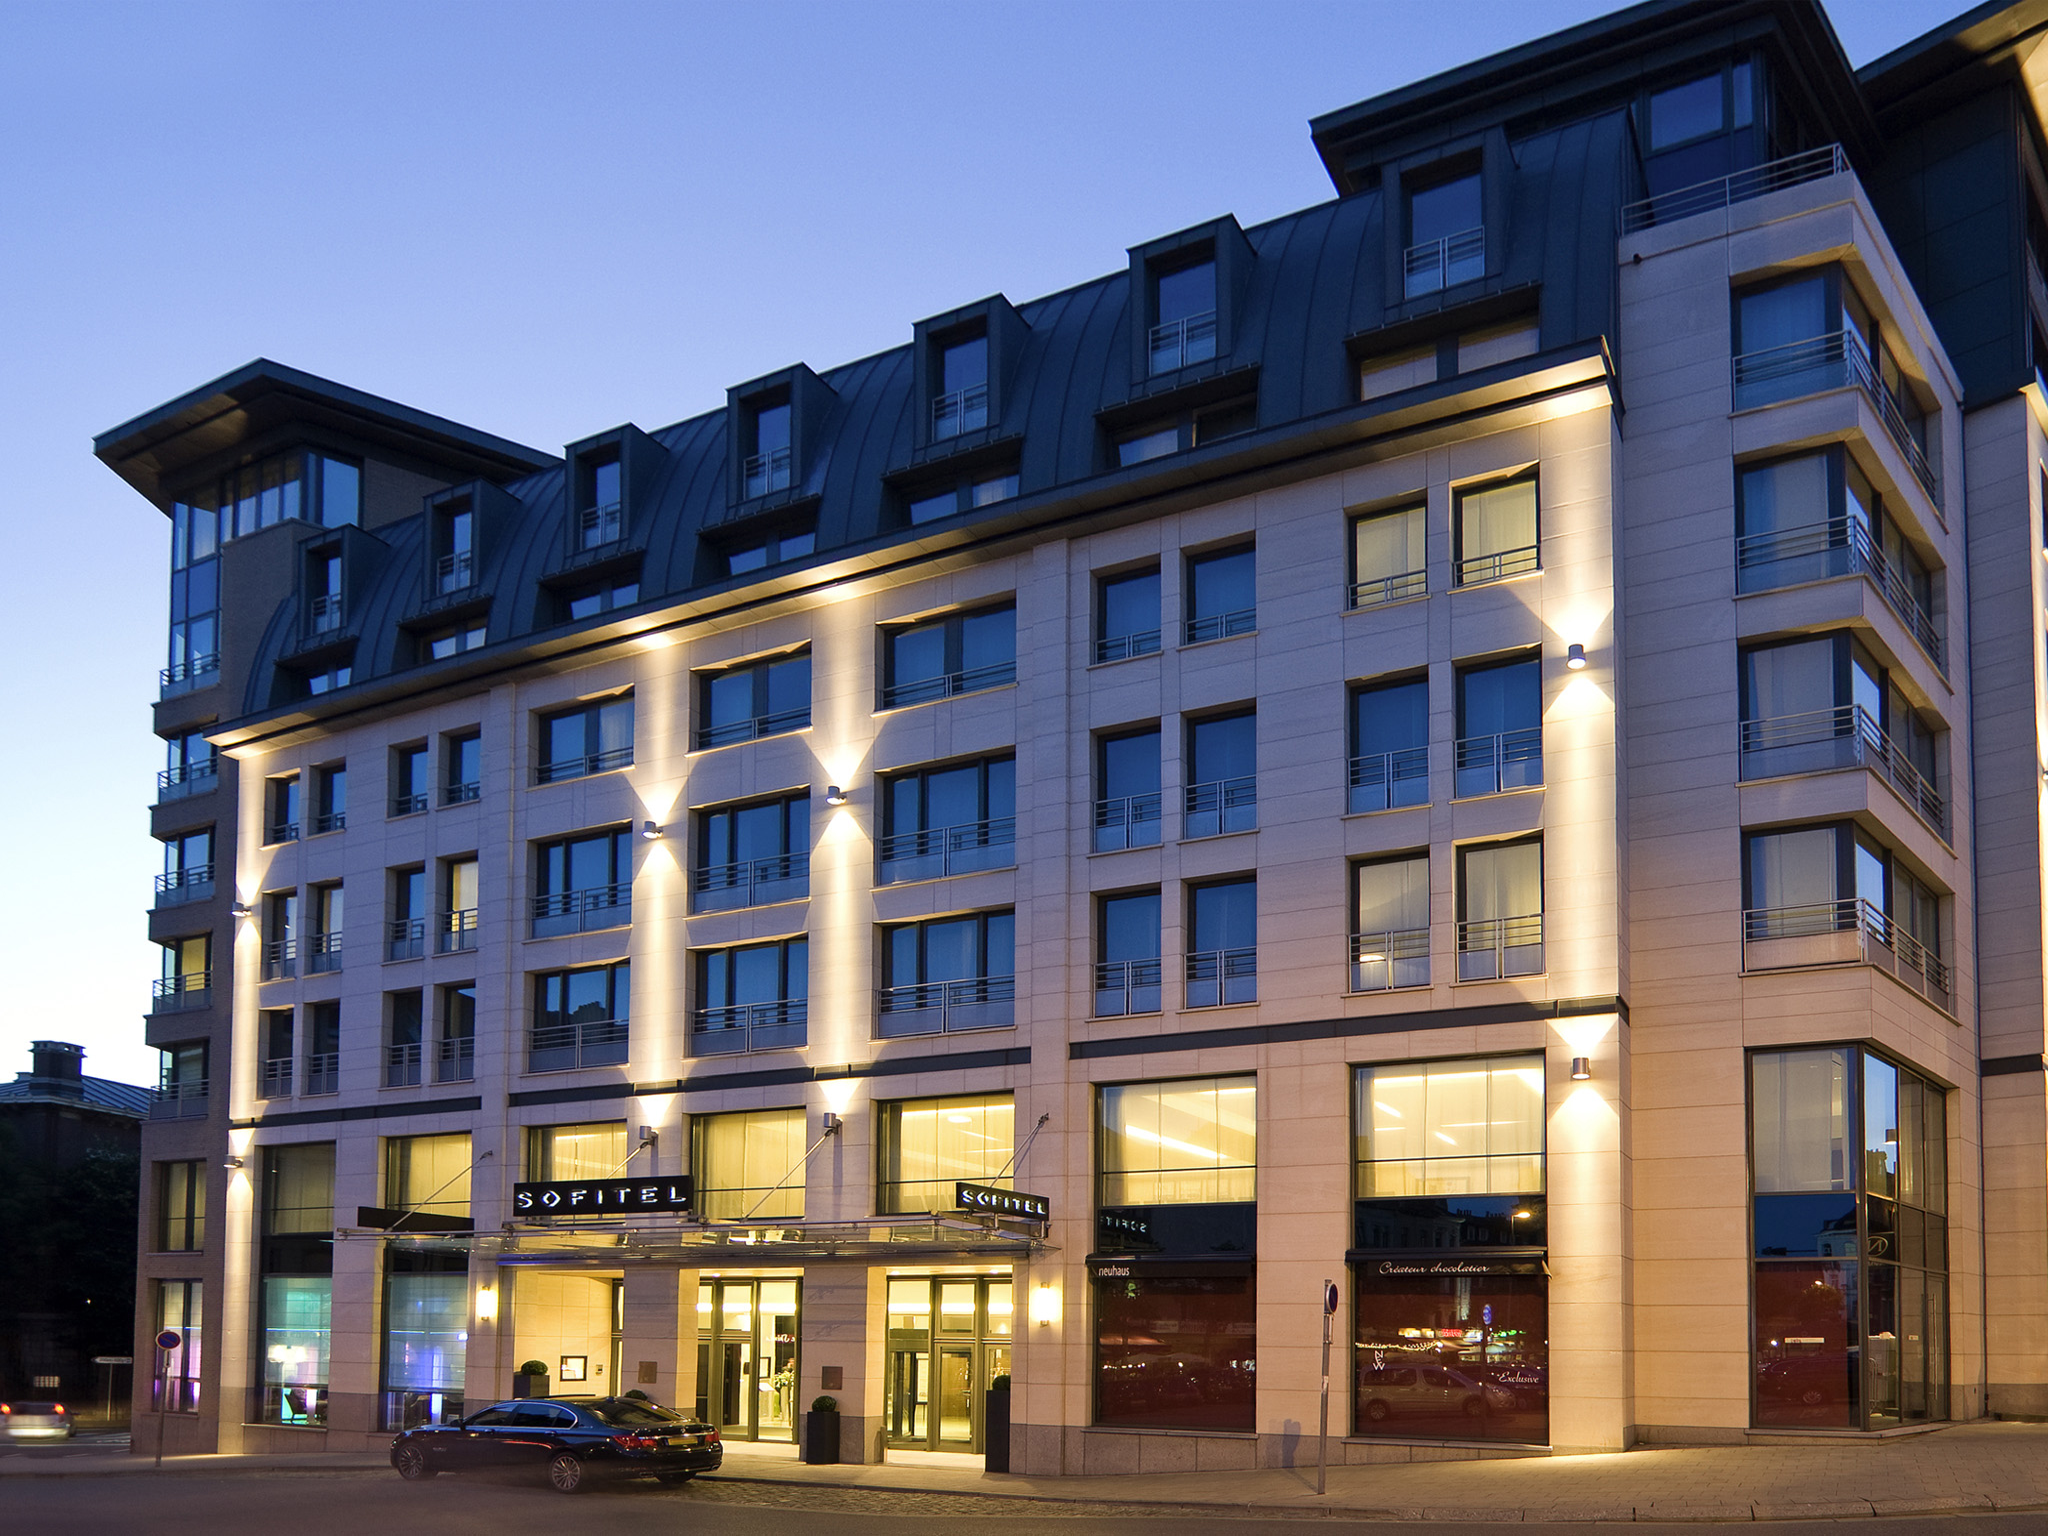 فندق - سوفيتل Sofitel براسيلز يوروب